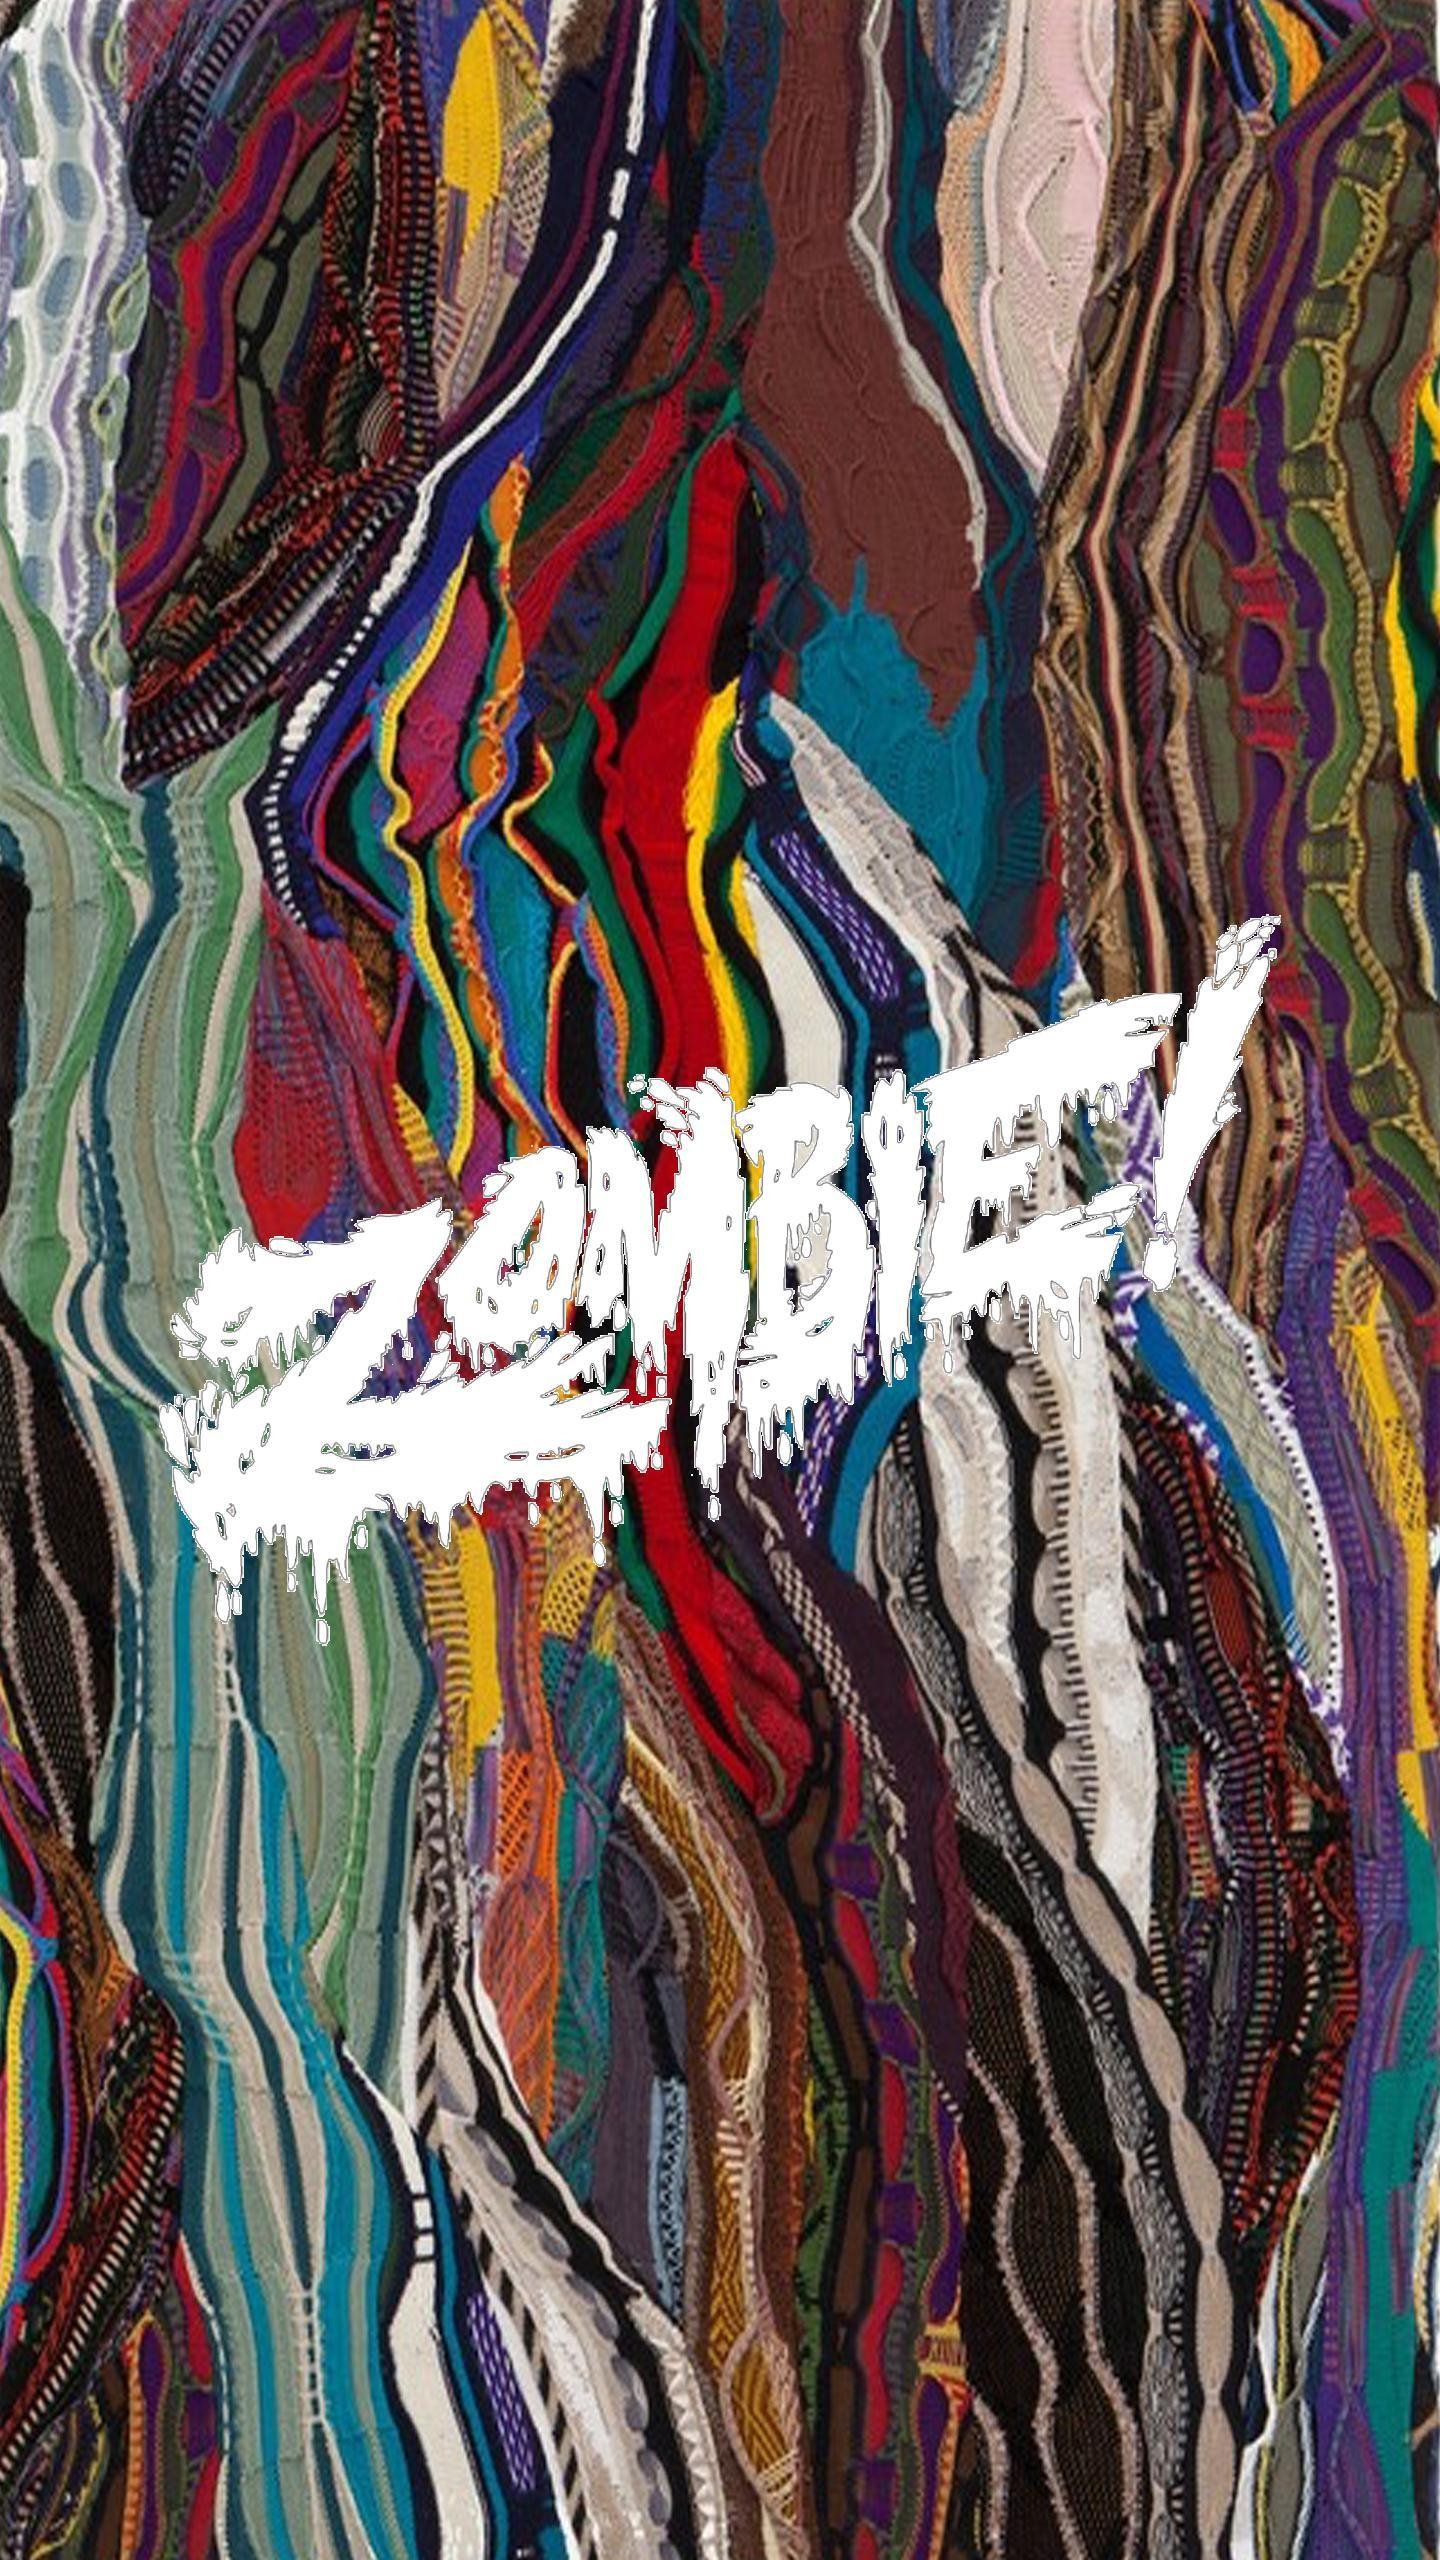 Flatbush Zombies Coogi Print